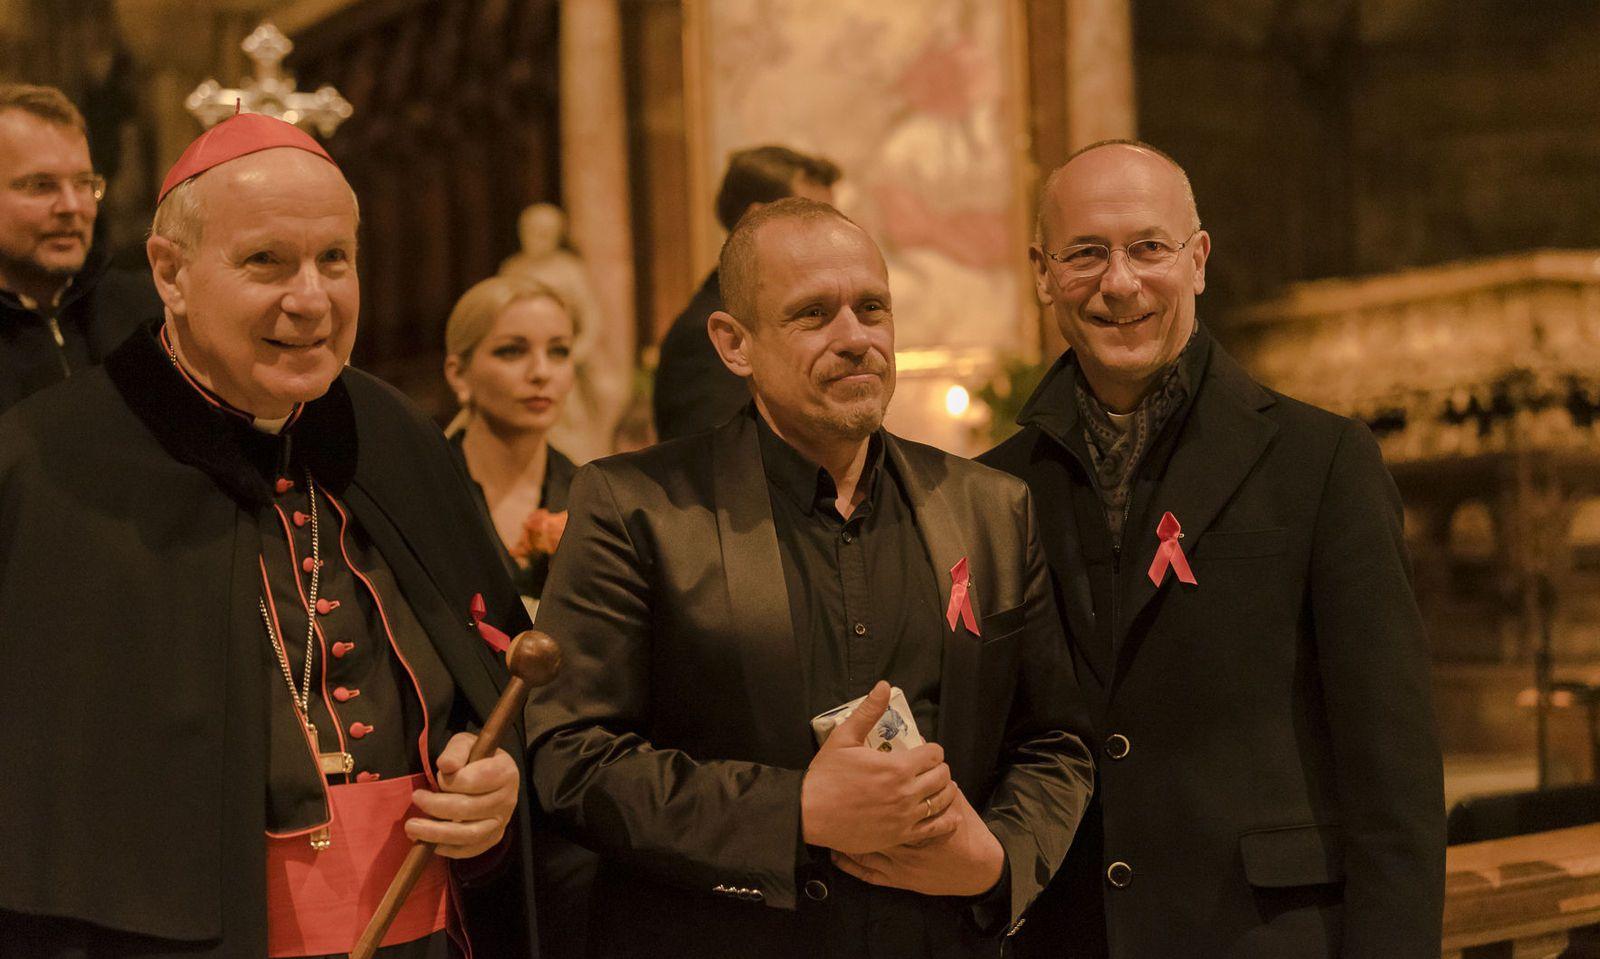 Kardinal Christoph Schönborn, Gery Keszler und Toni Faber